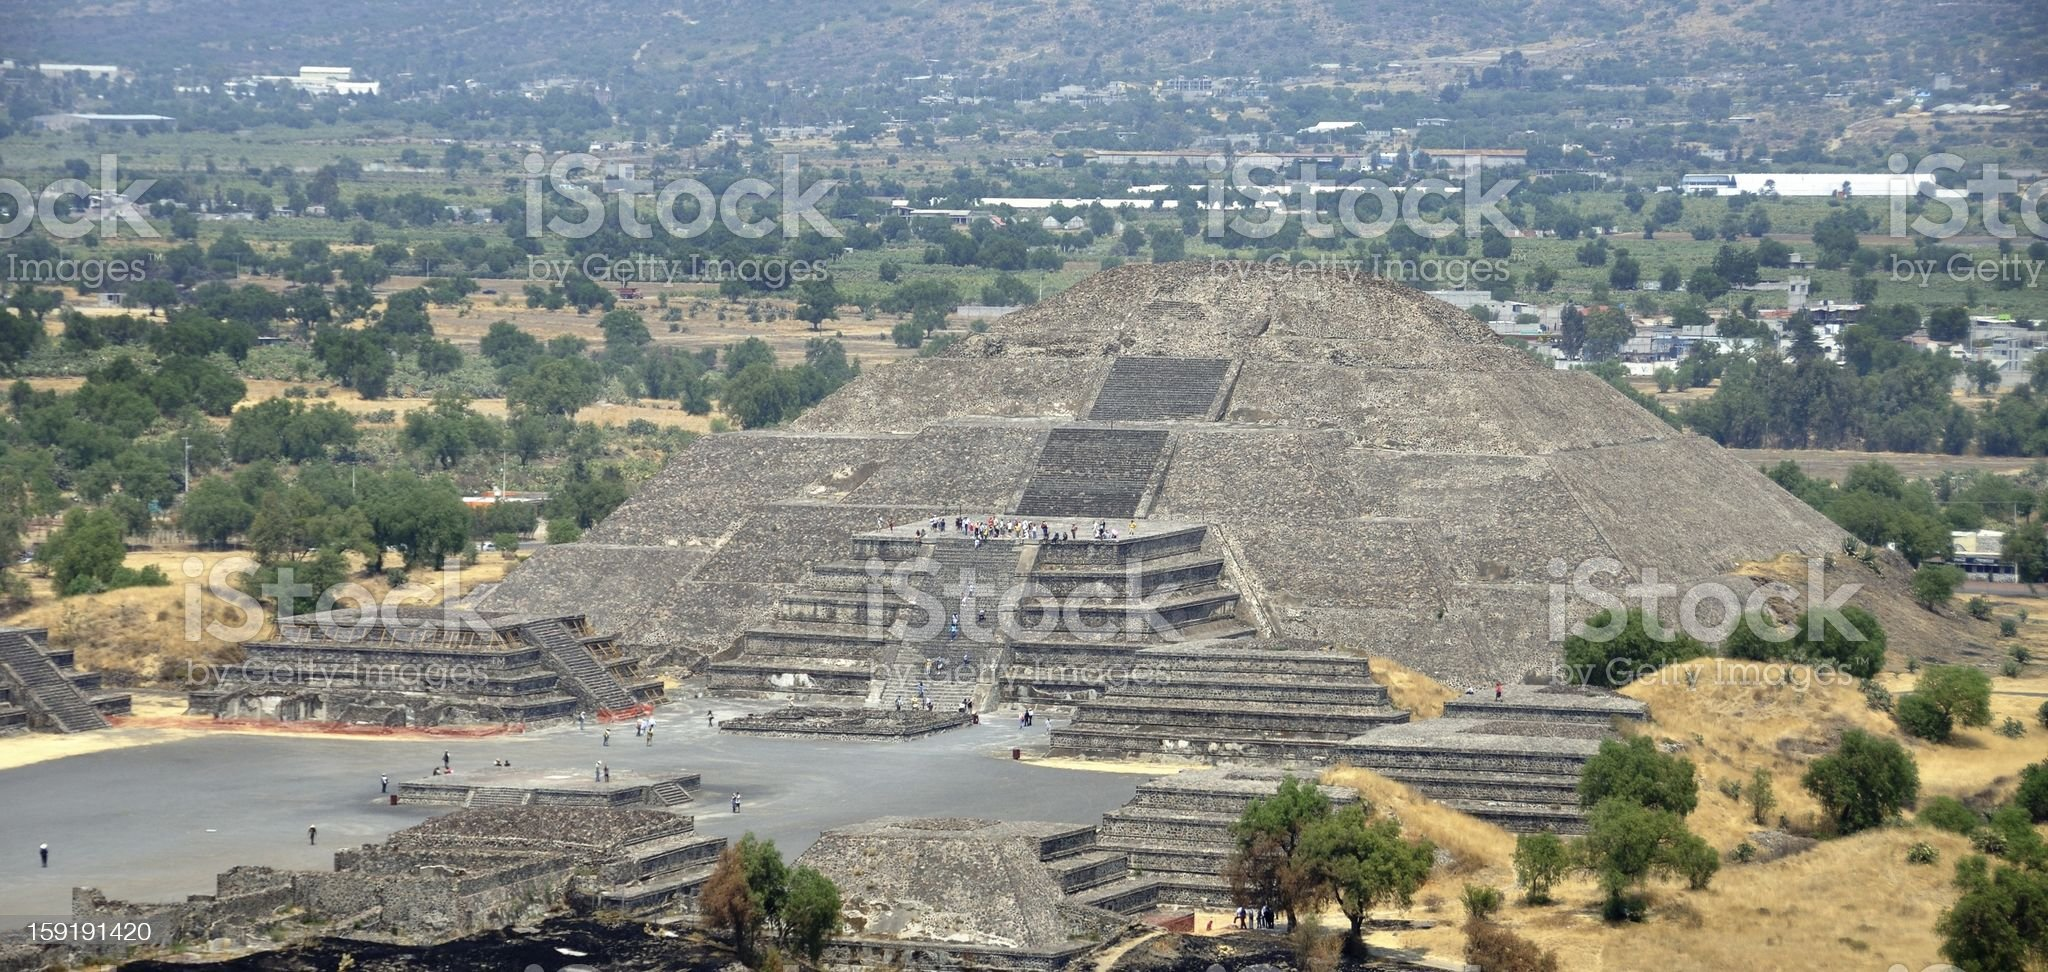 Teotihuacan Pyramids, Mexico royalty-free stock photo